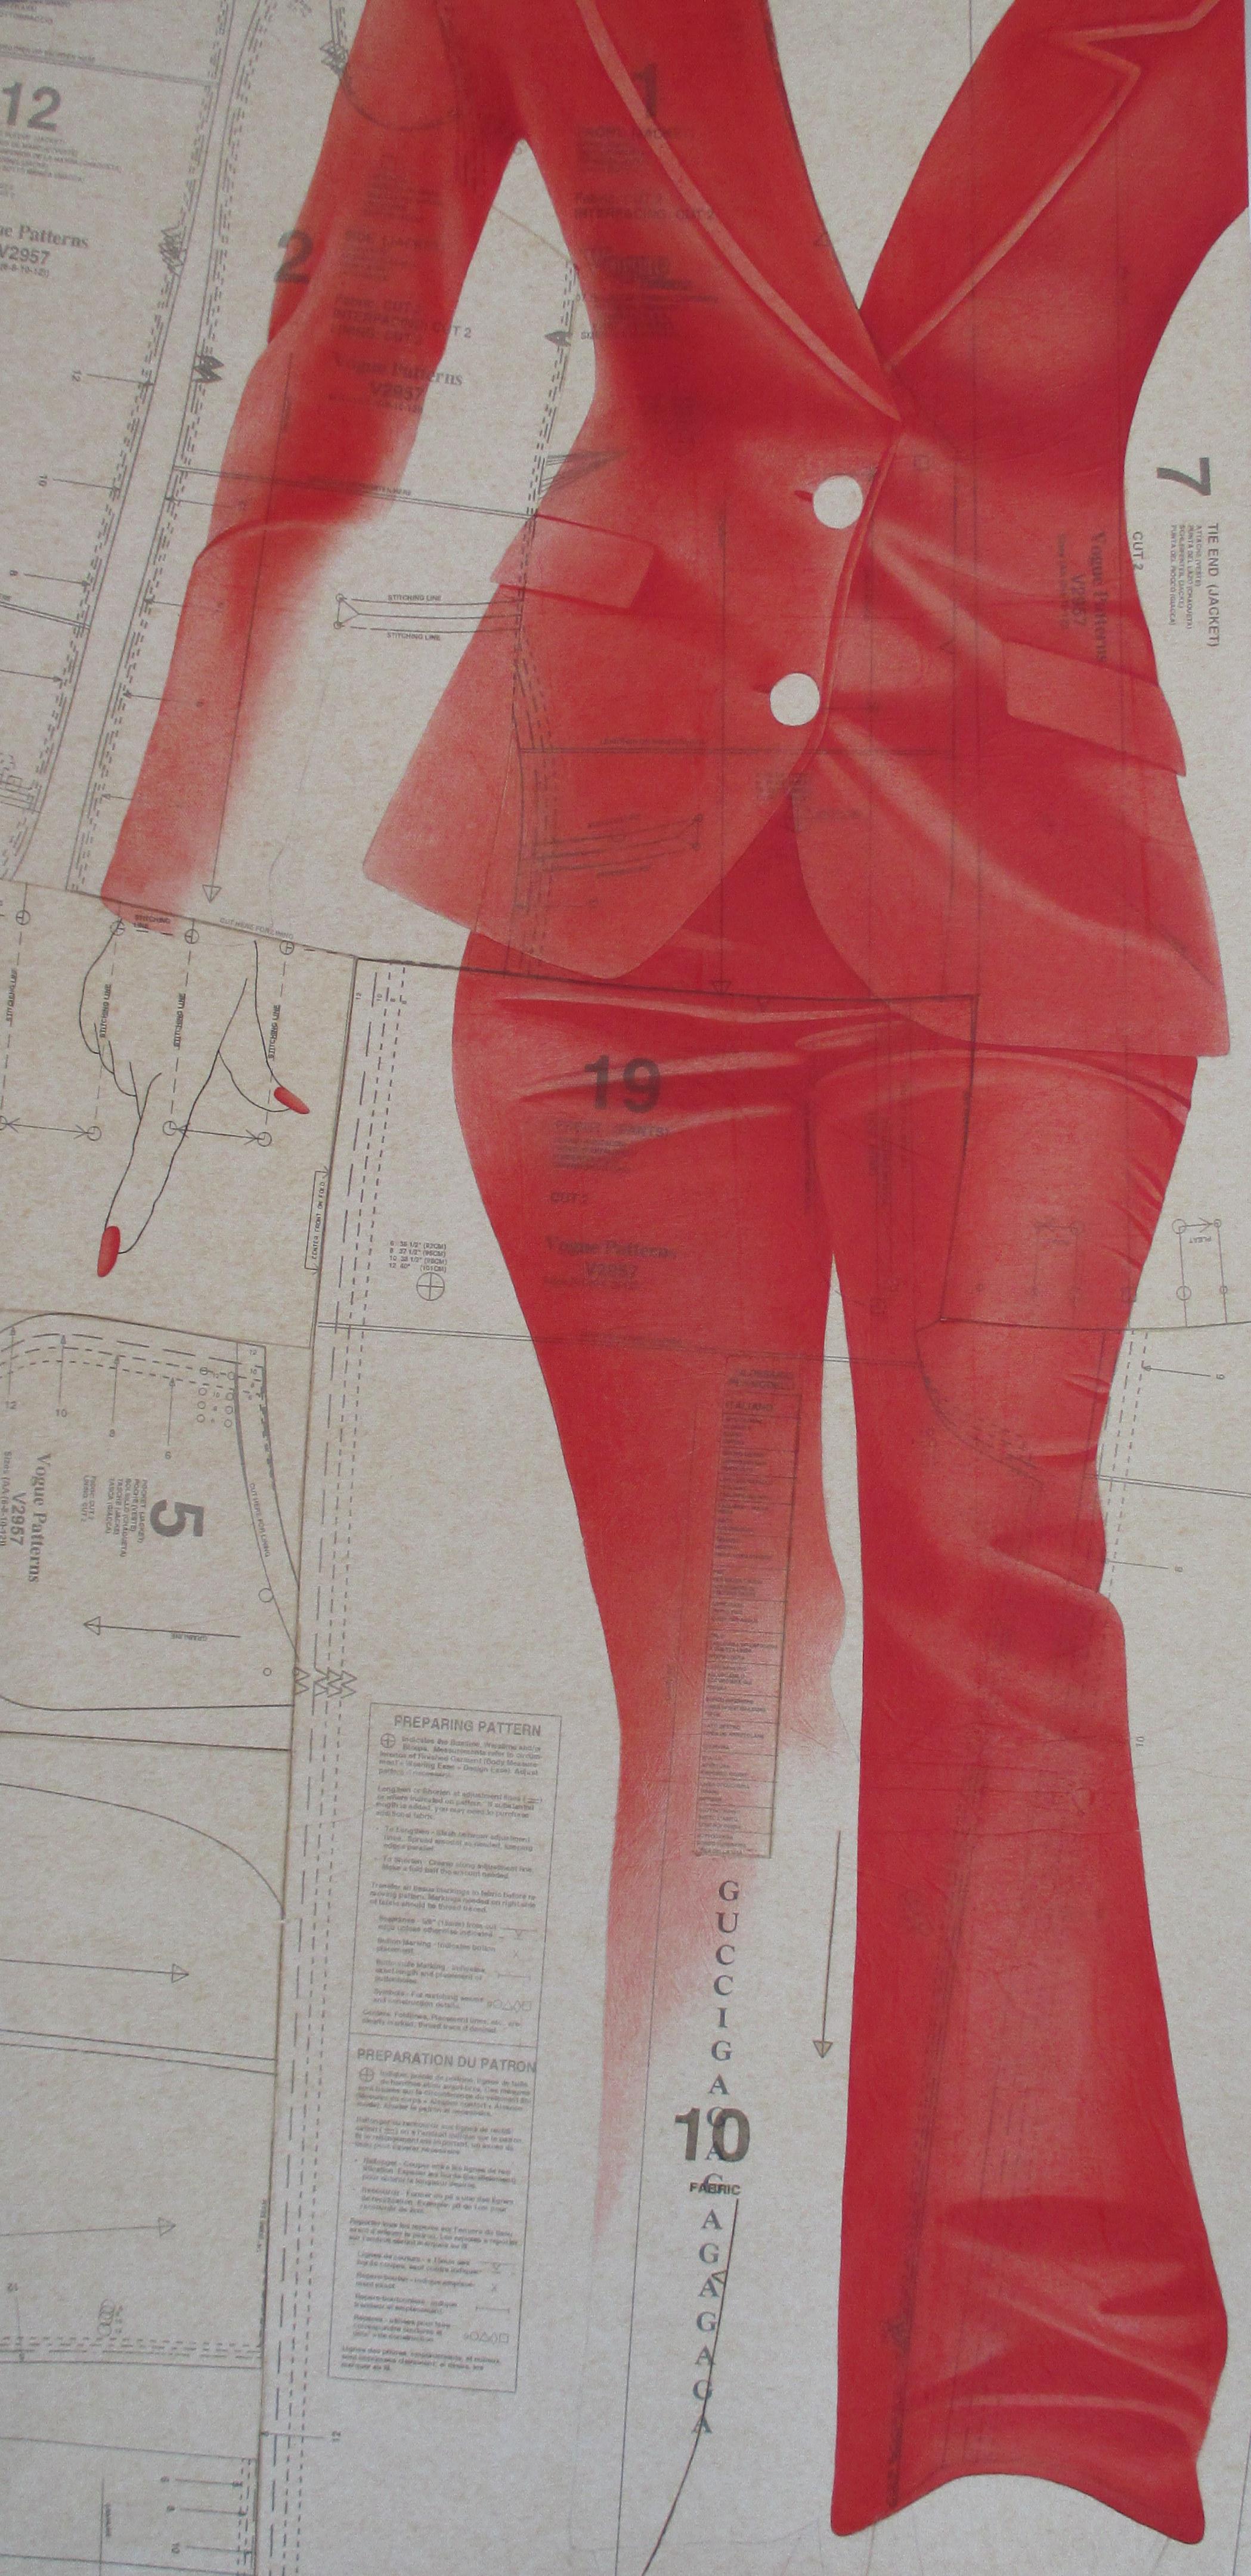 Sochor  'Gaga' oil on collaged sewing pattern paper 24x48.jpg